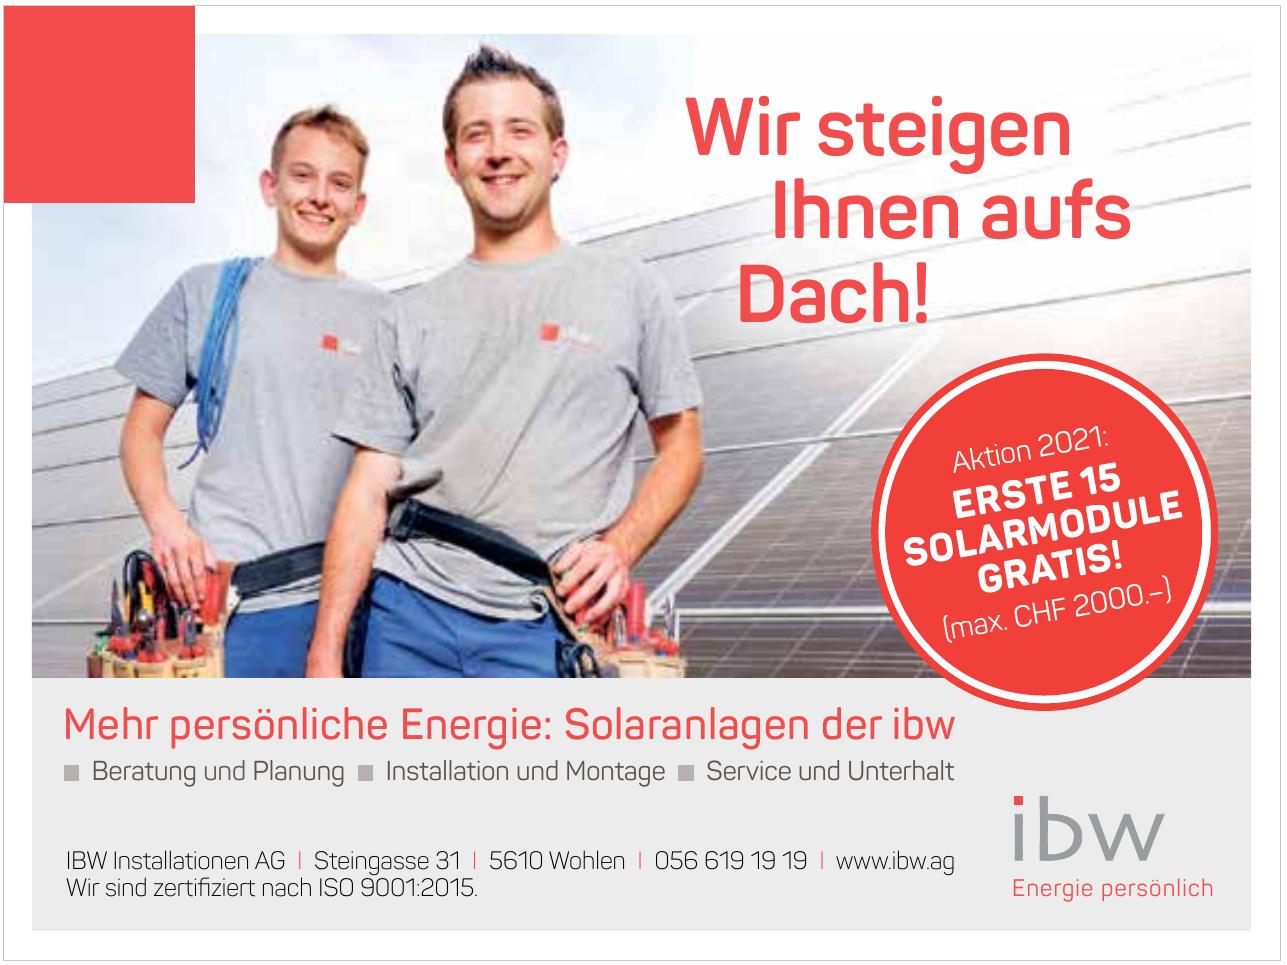 IBW Instalationen AG